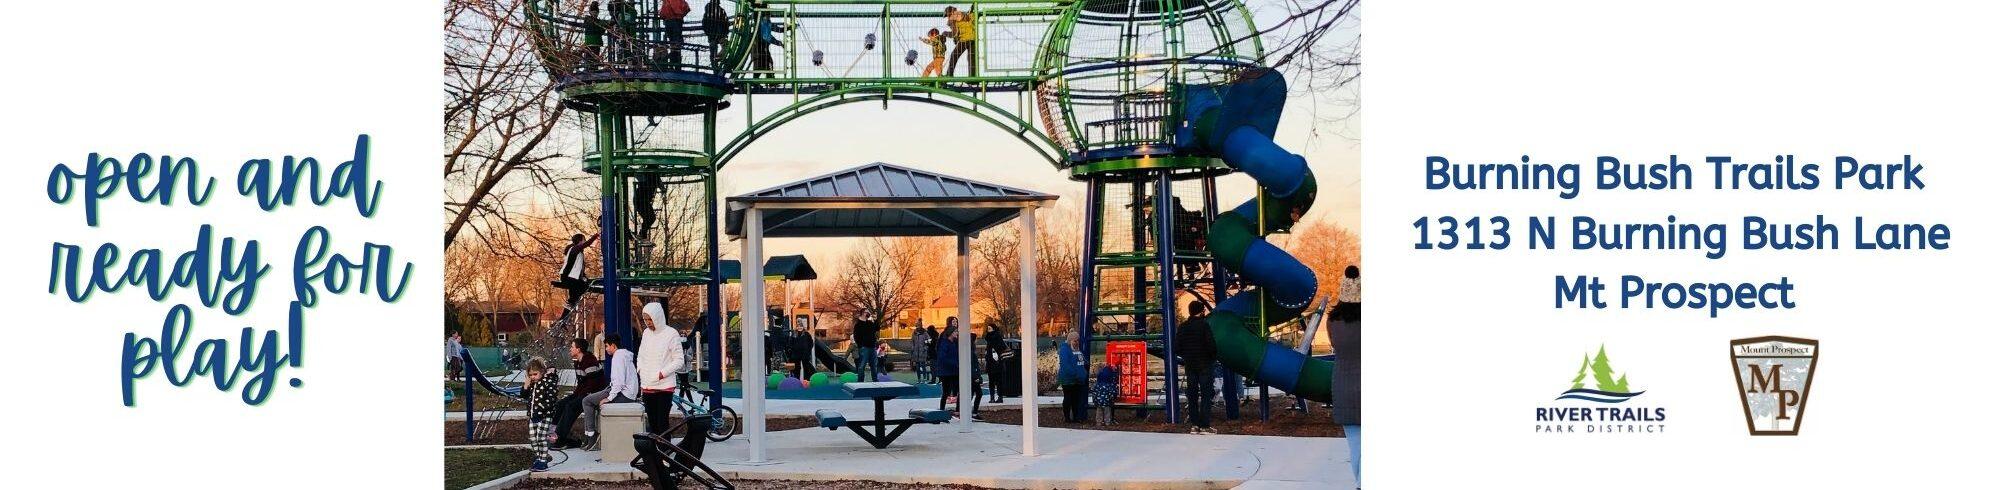 kids playing on burning bush park playground